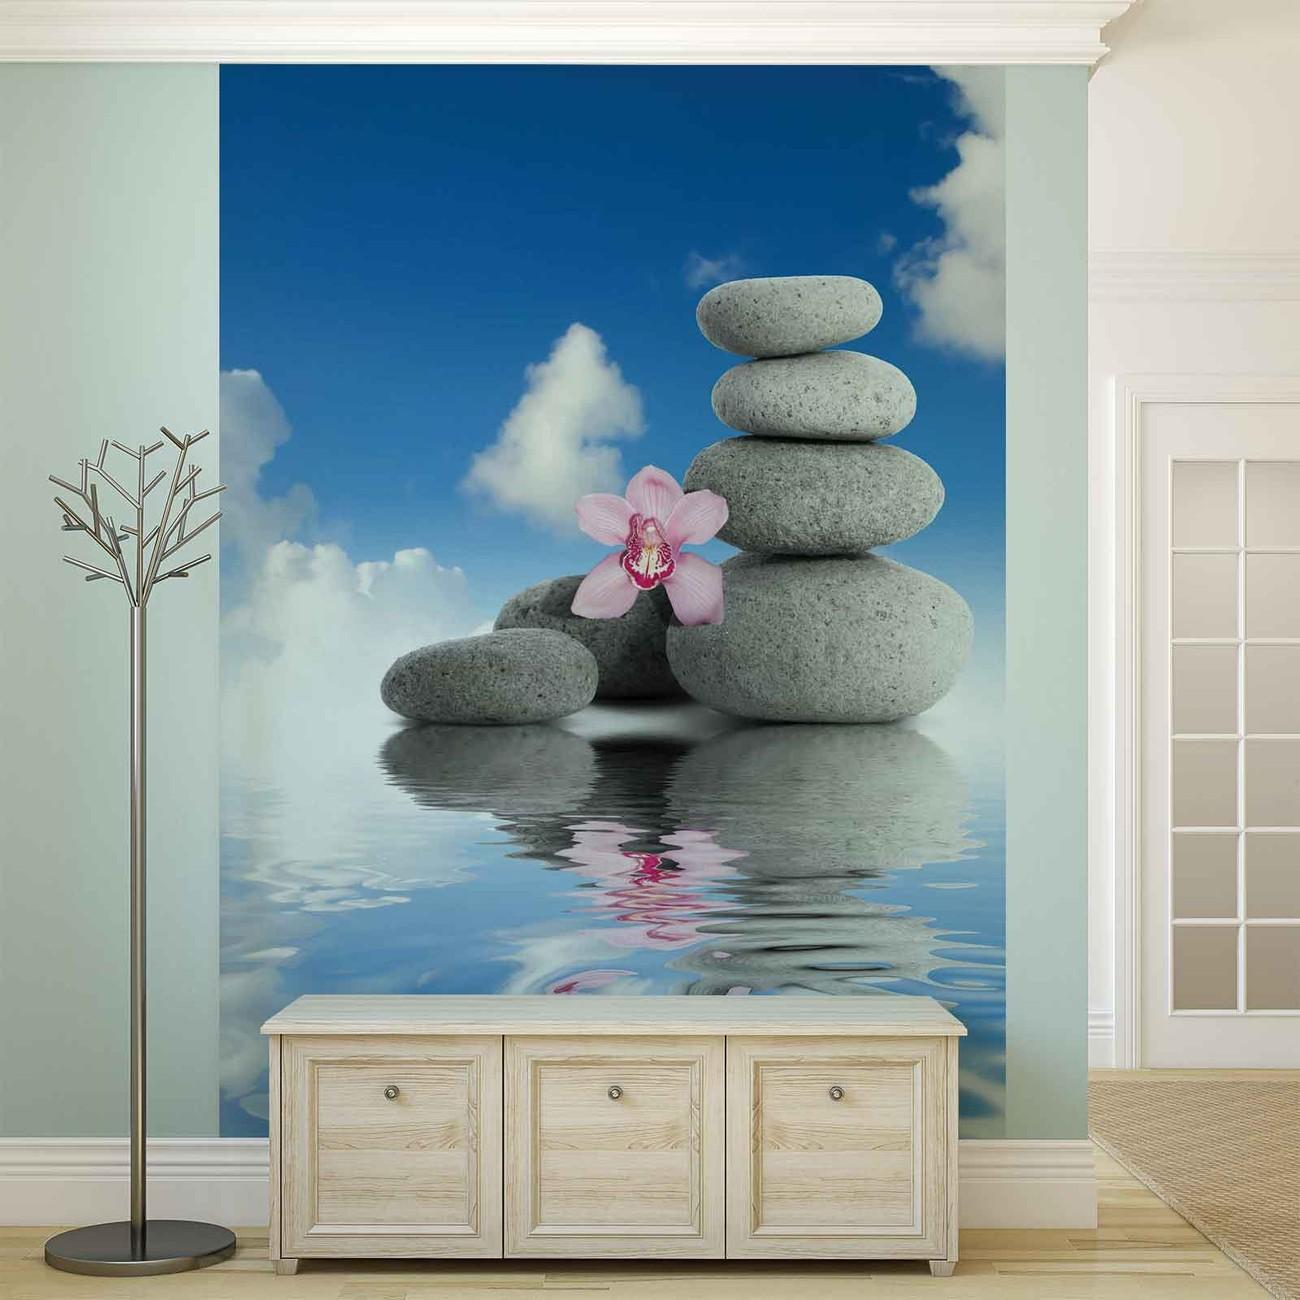 Zen Water Stones Orchid Sky Wall Paper Mural Buy at Abposterscom